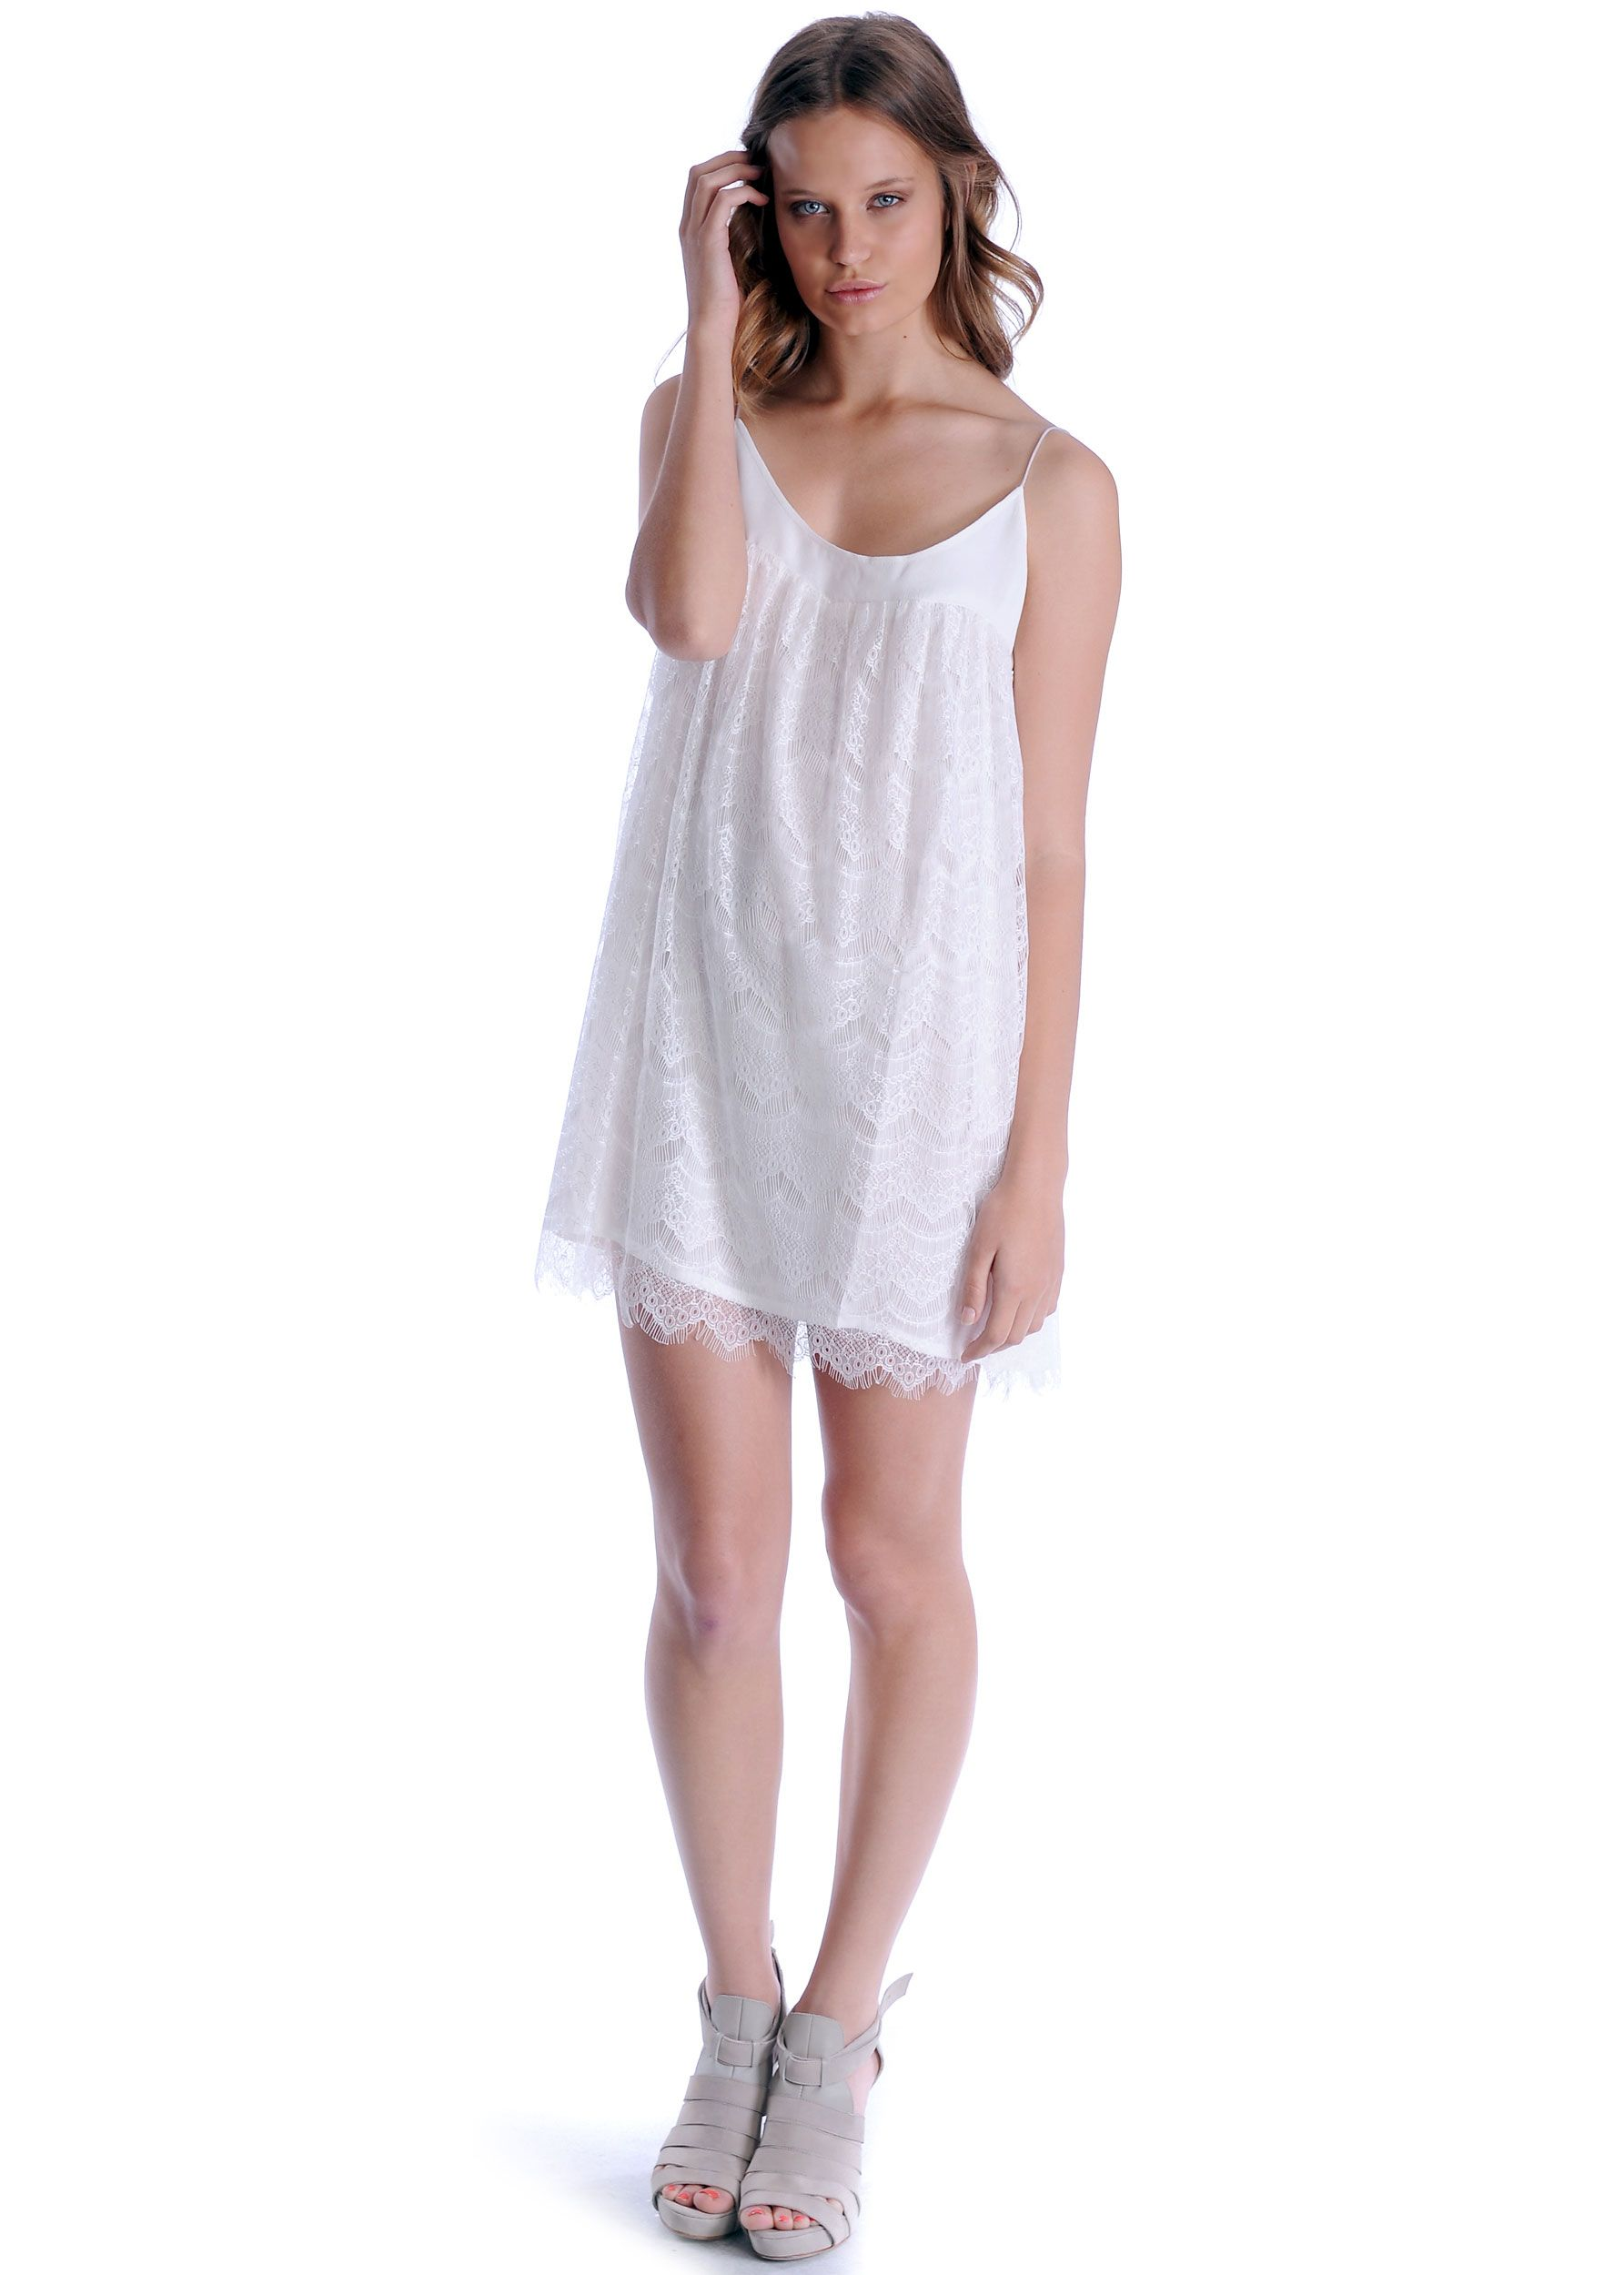 Cute white dress cute white dress dresses designer dresses